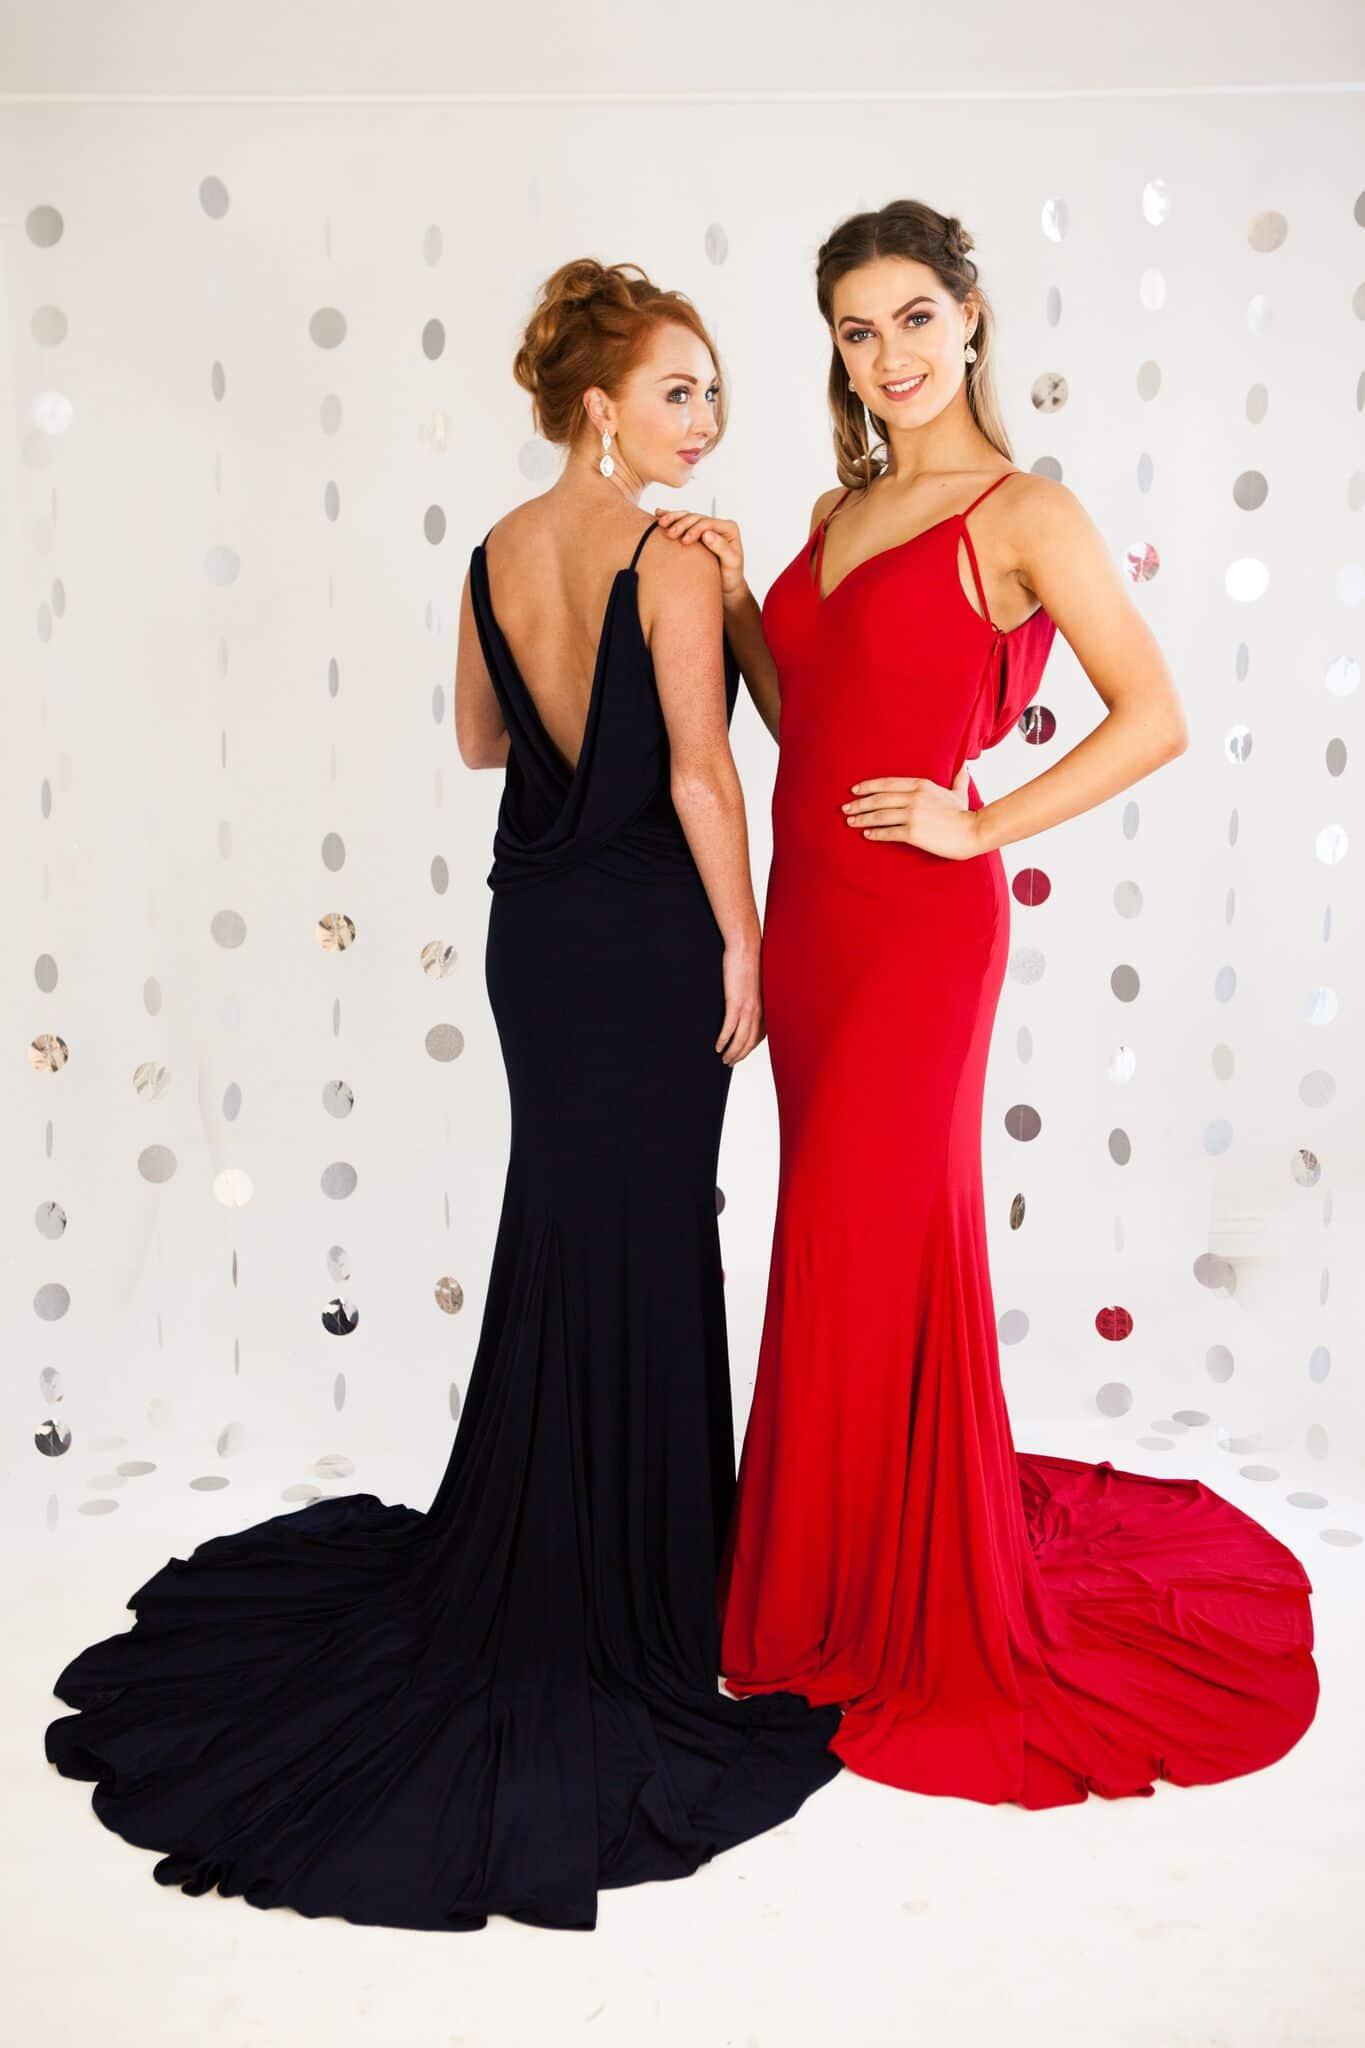 VA Prom Dresses